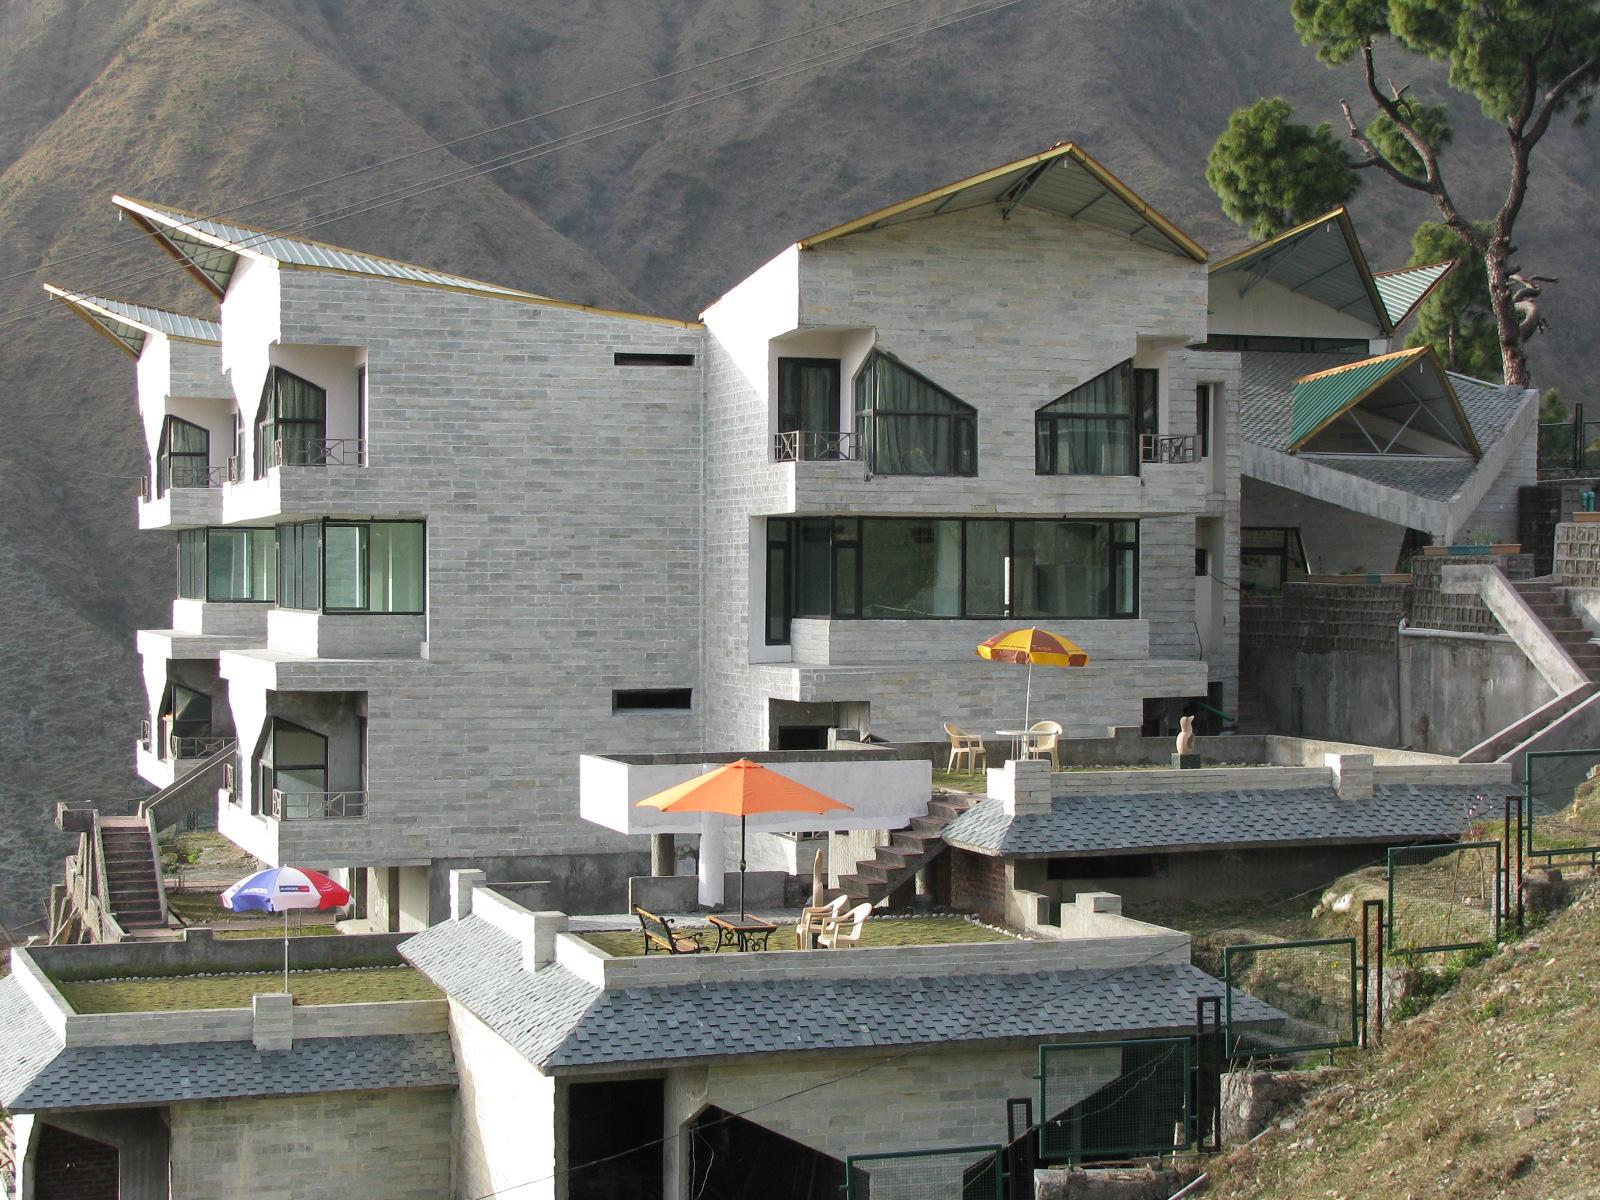 The Citadel Resorts in Palampur